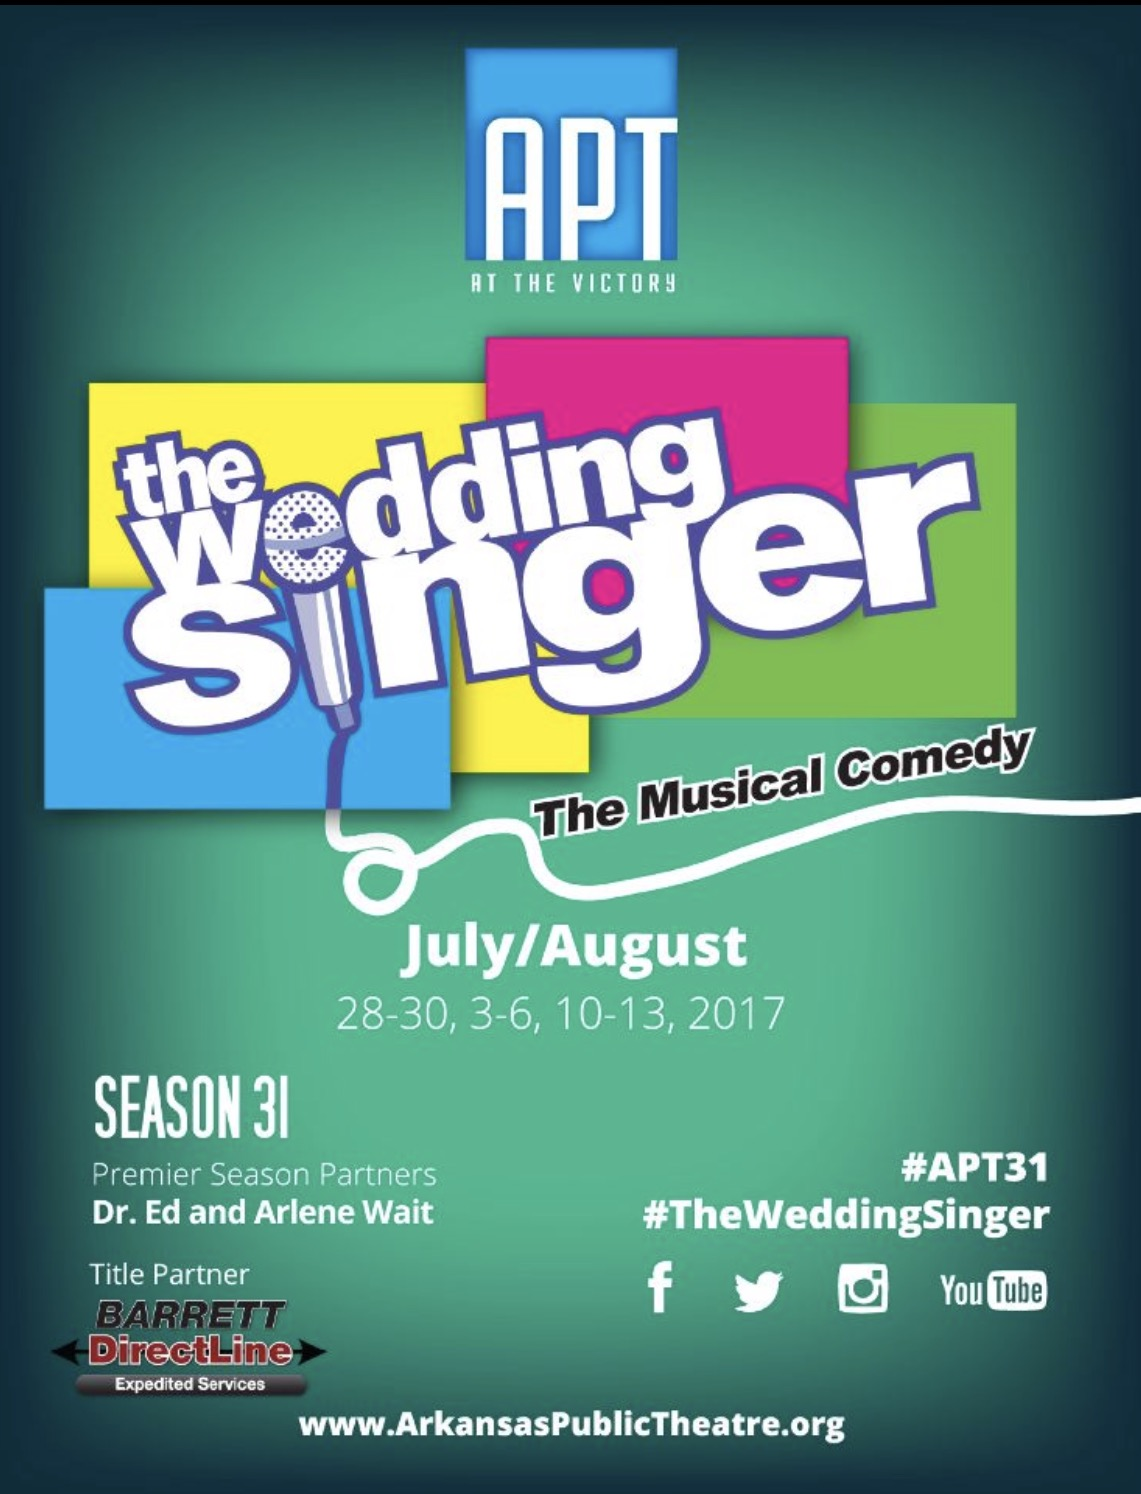 Season 31 | THE WEDDING SINGER